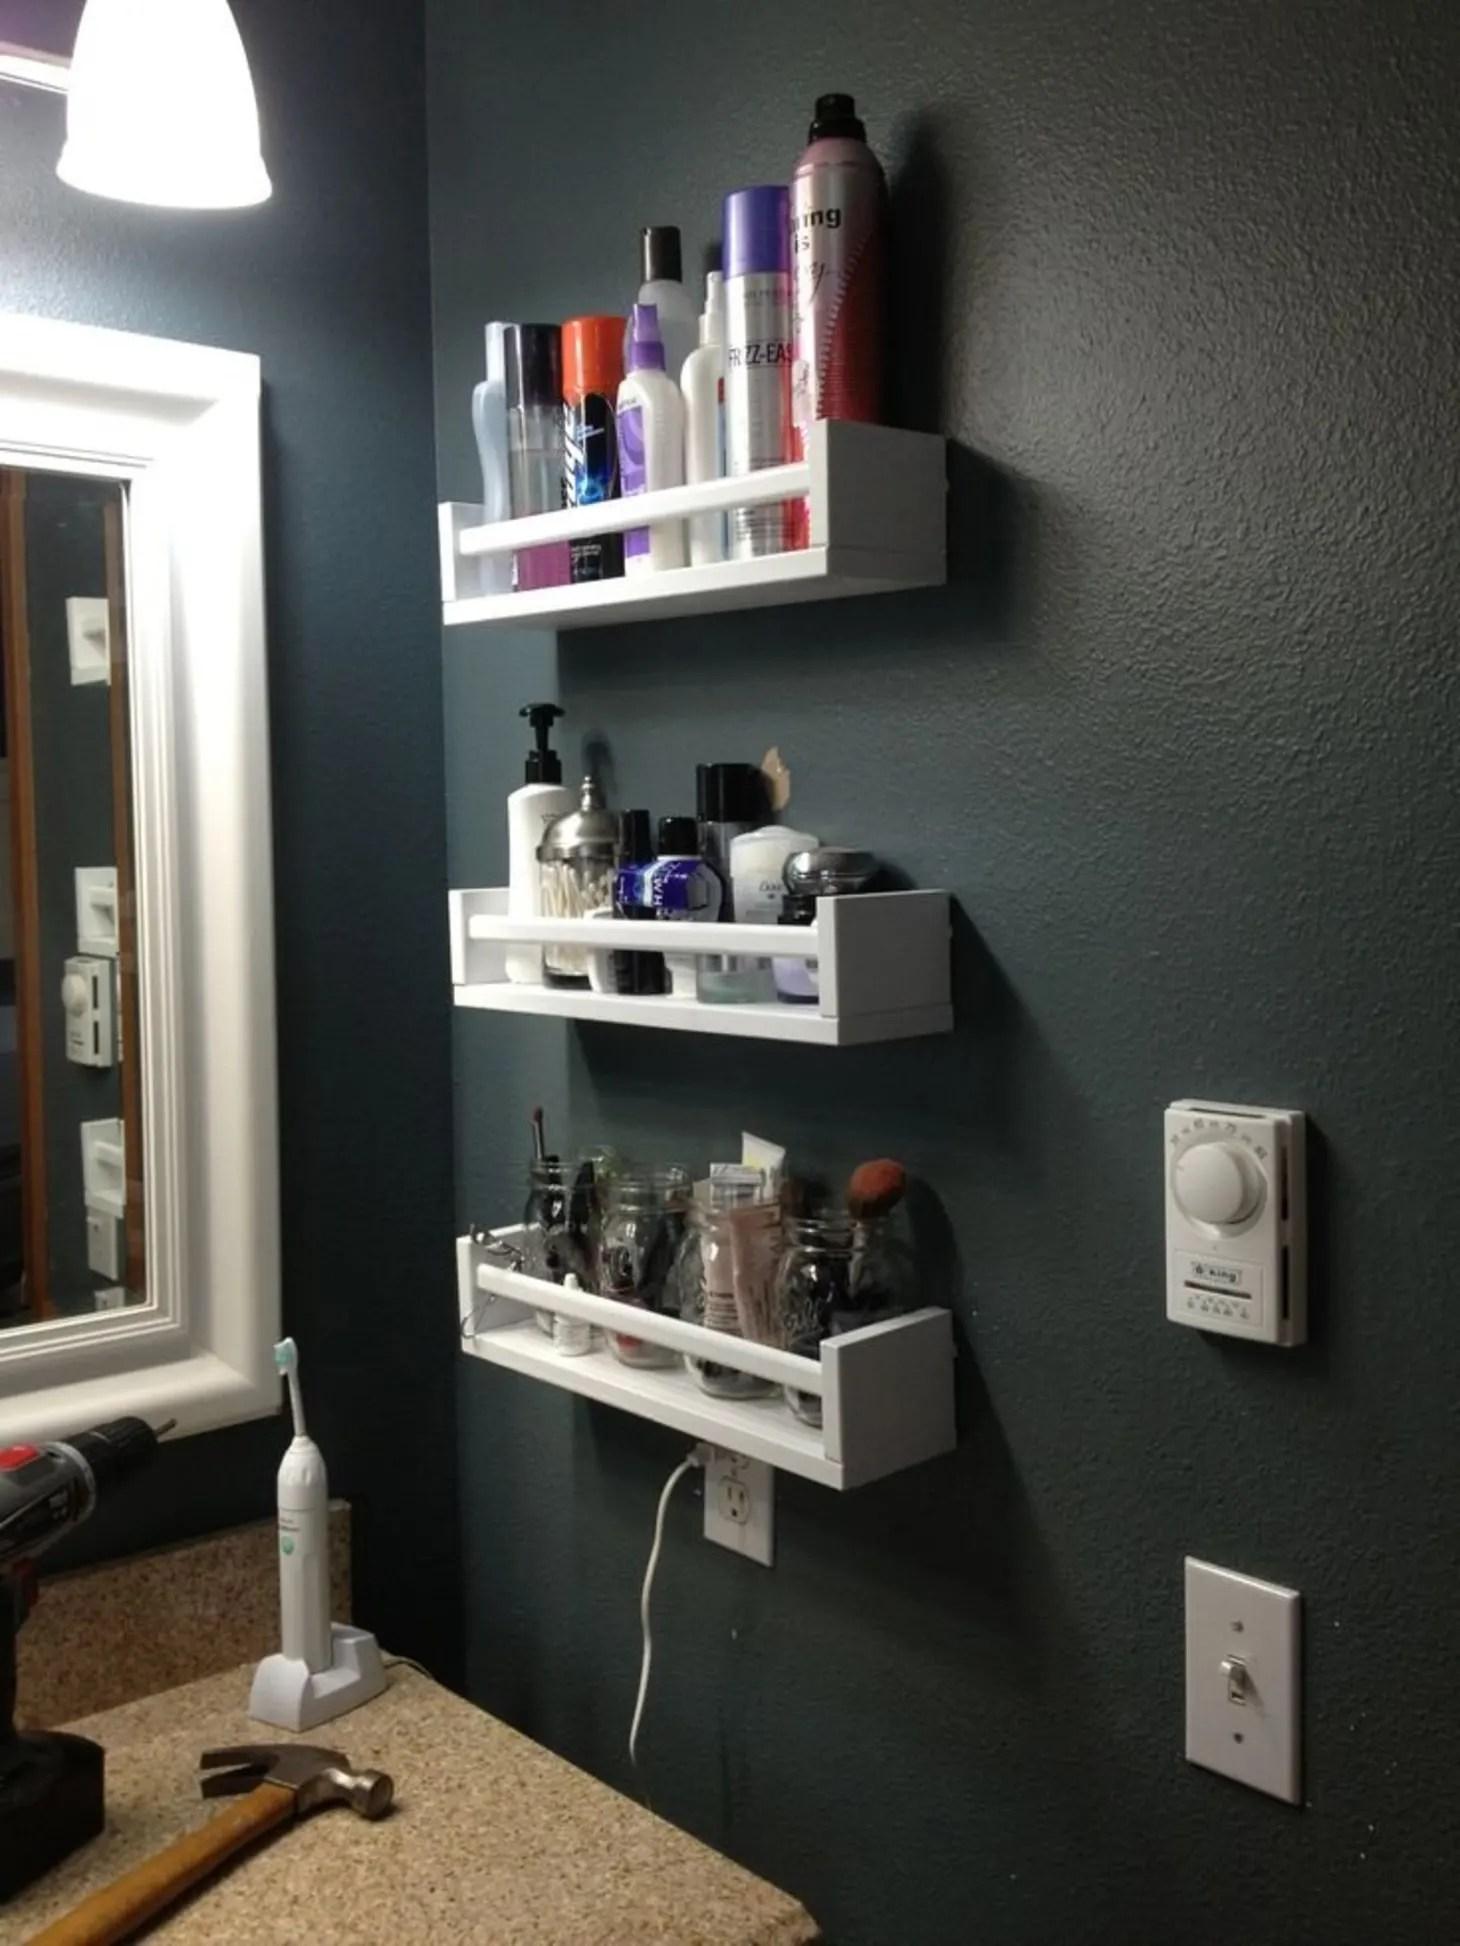 Bathroom Storage Ideas - Storage For Small Bathrooms ... on Small Apartment Bathroom Storage Ideas  id=97401